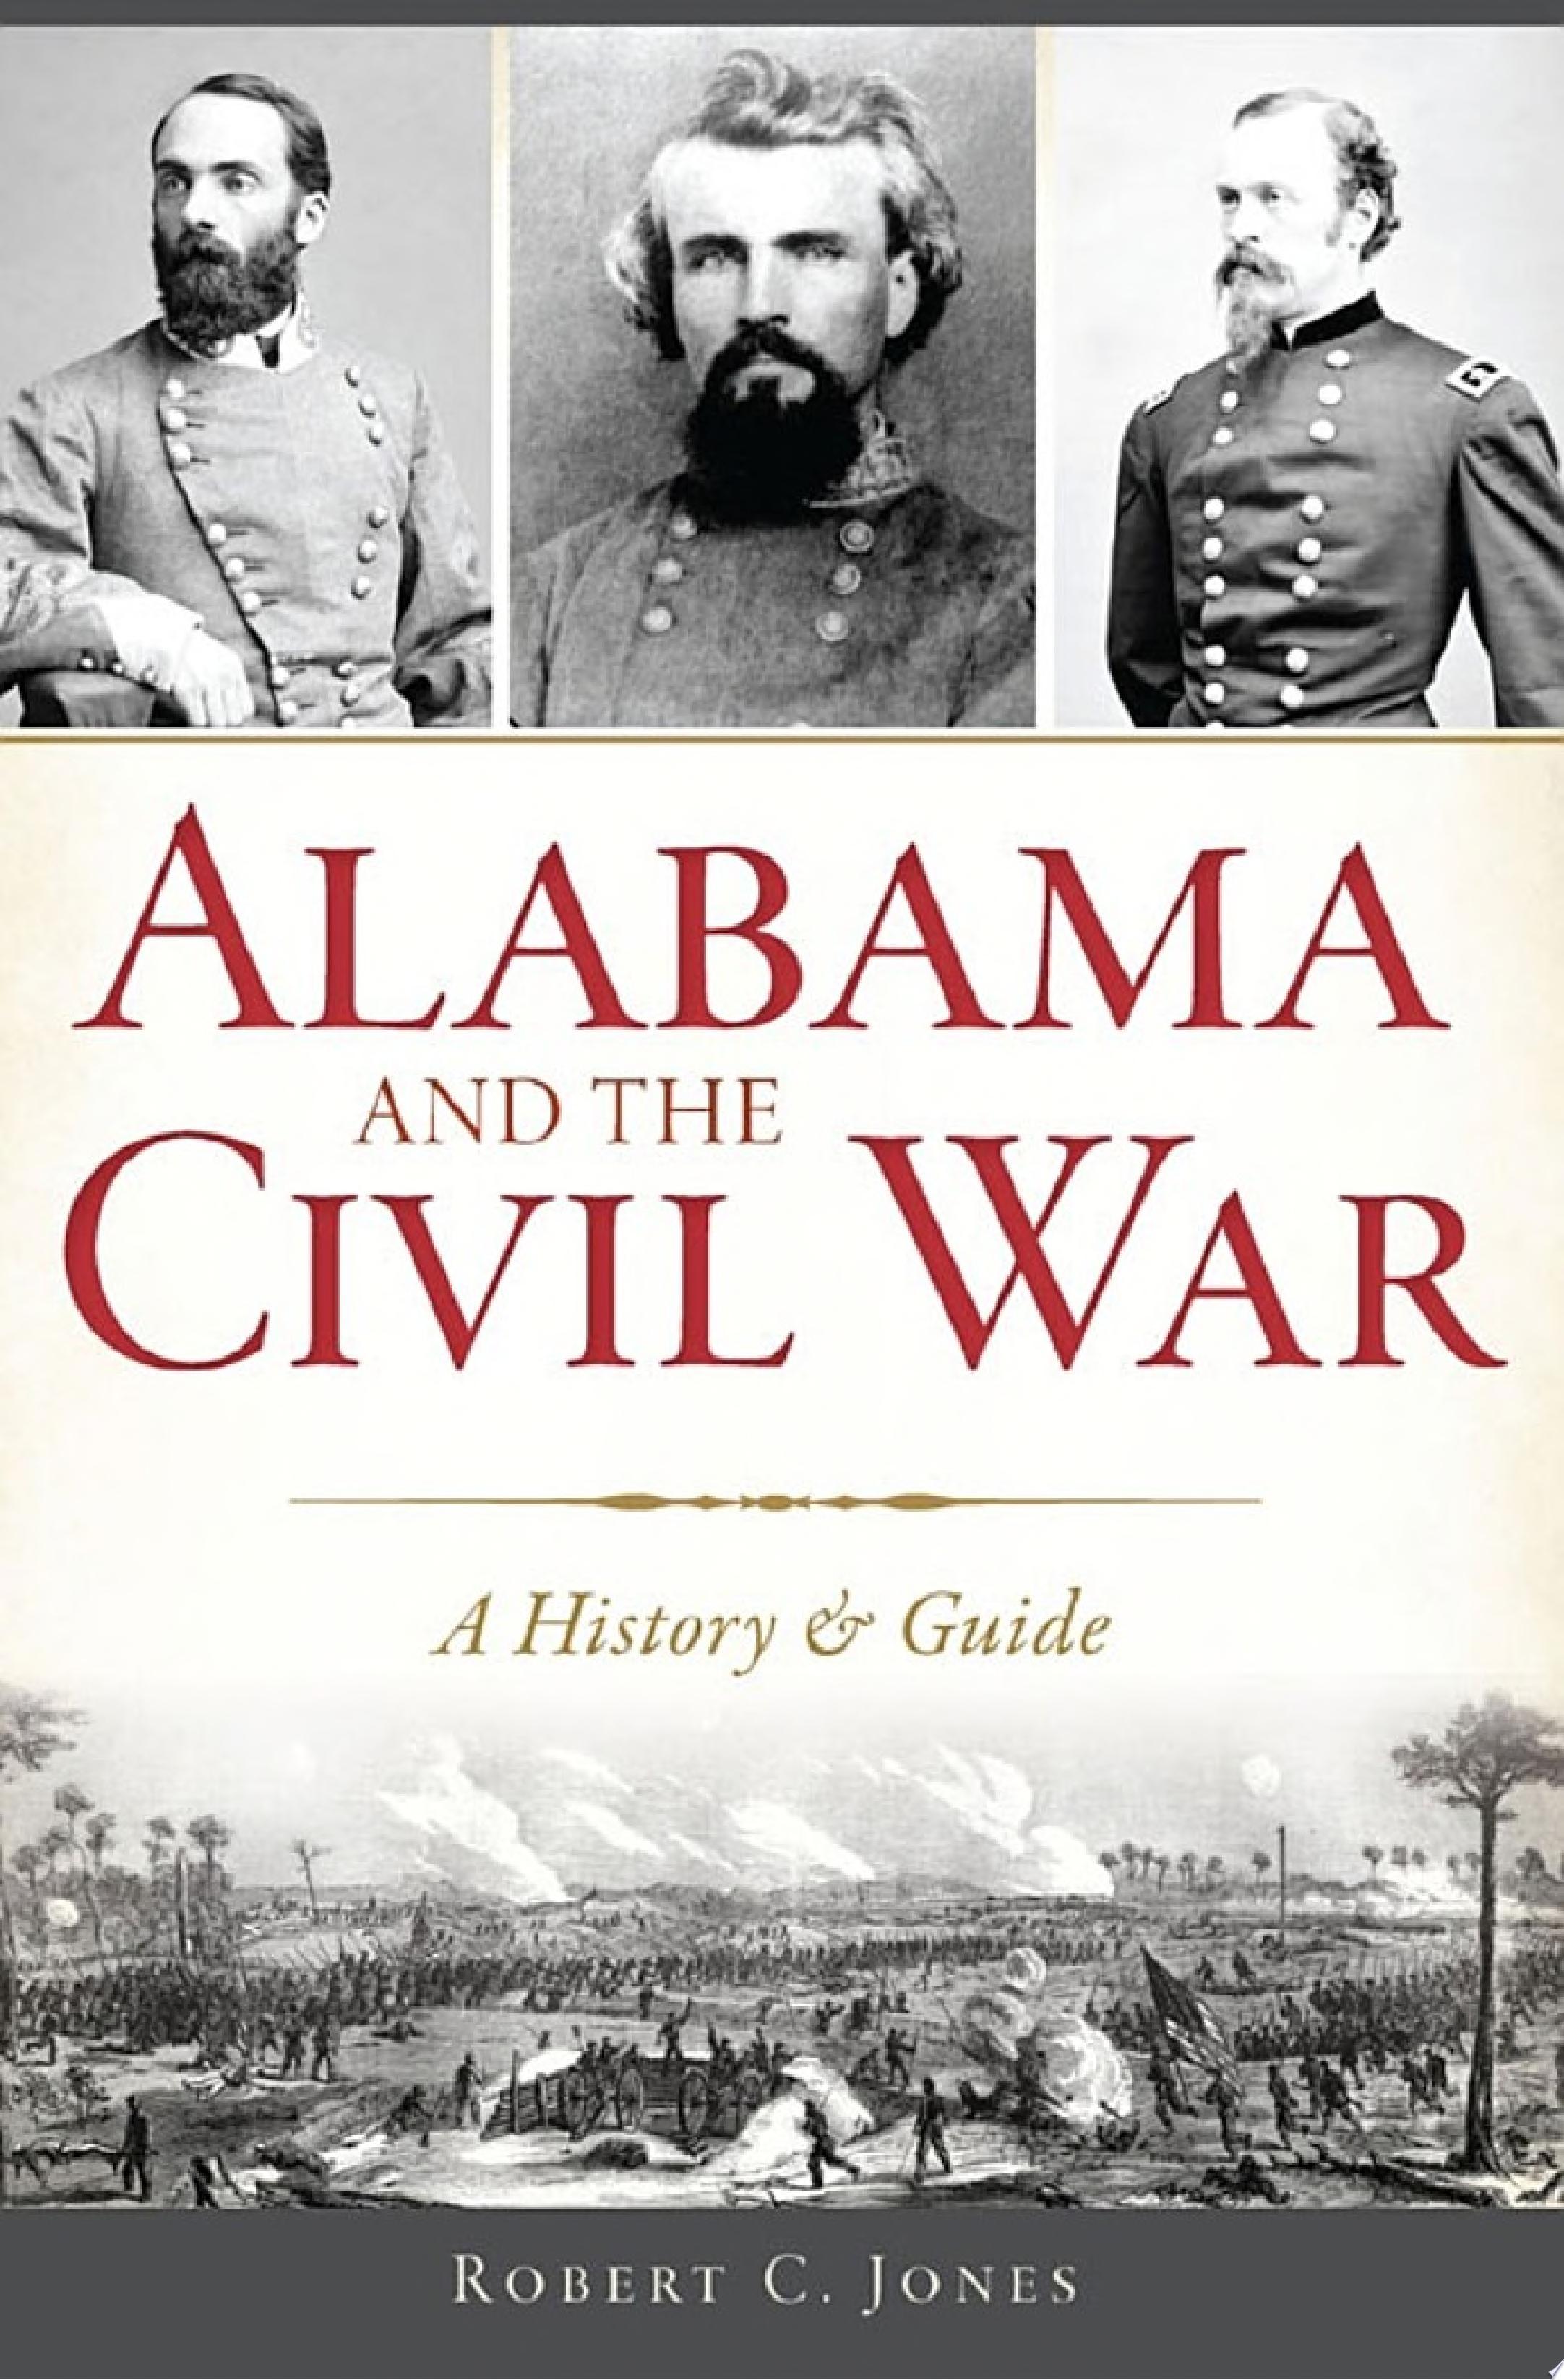 Alabama and the Civil War